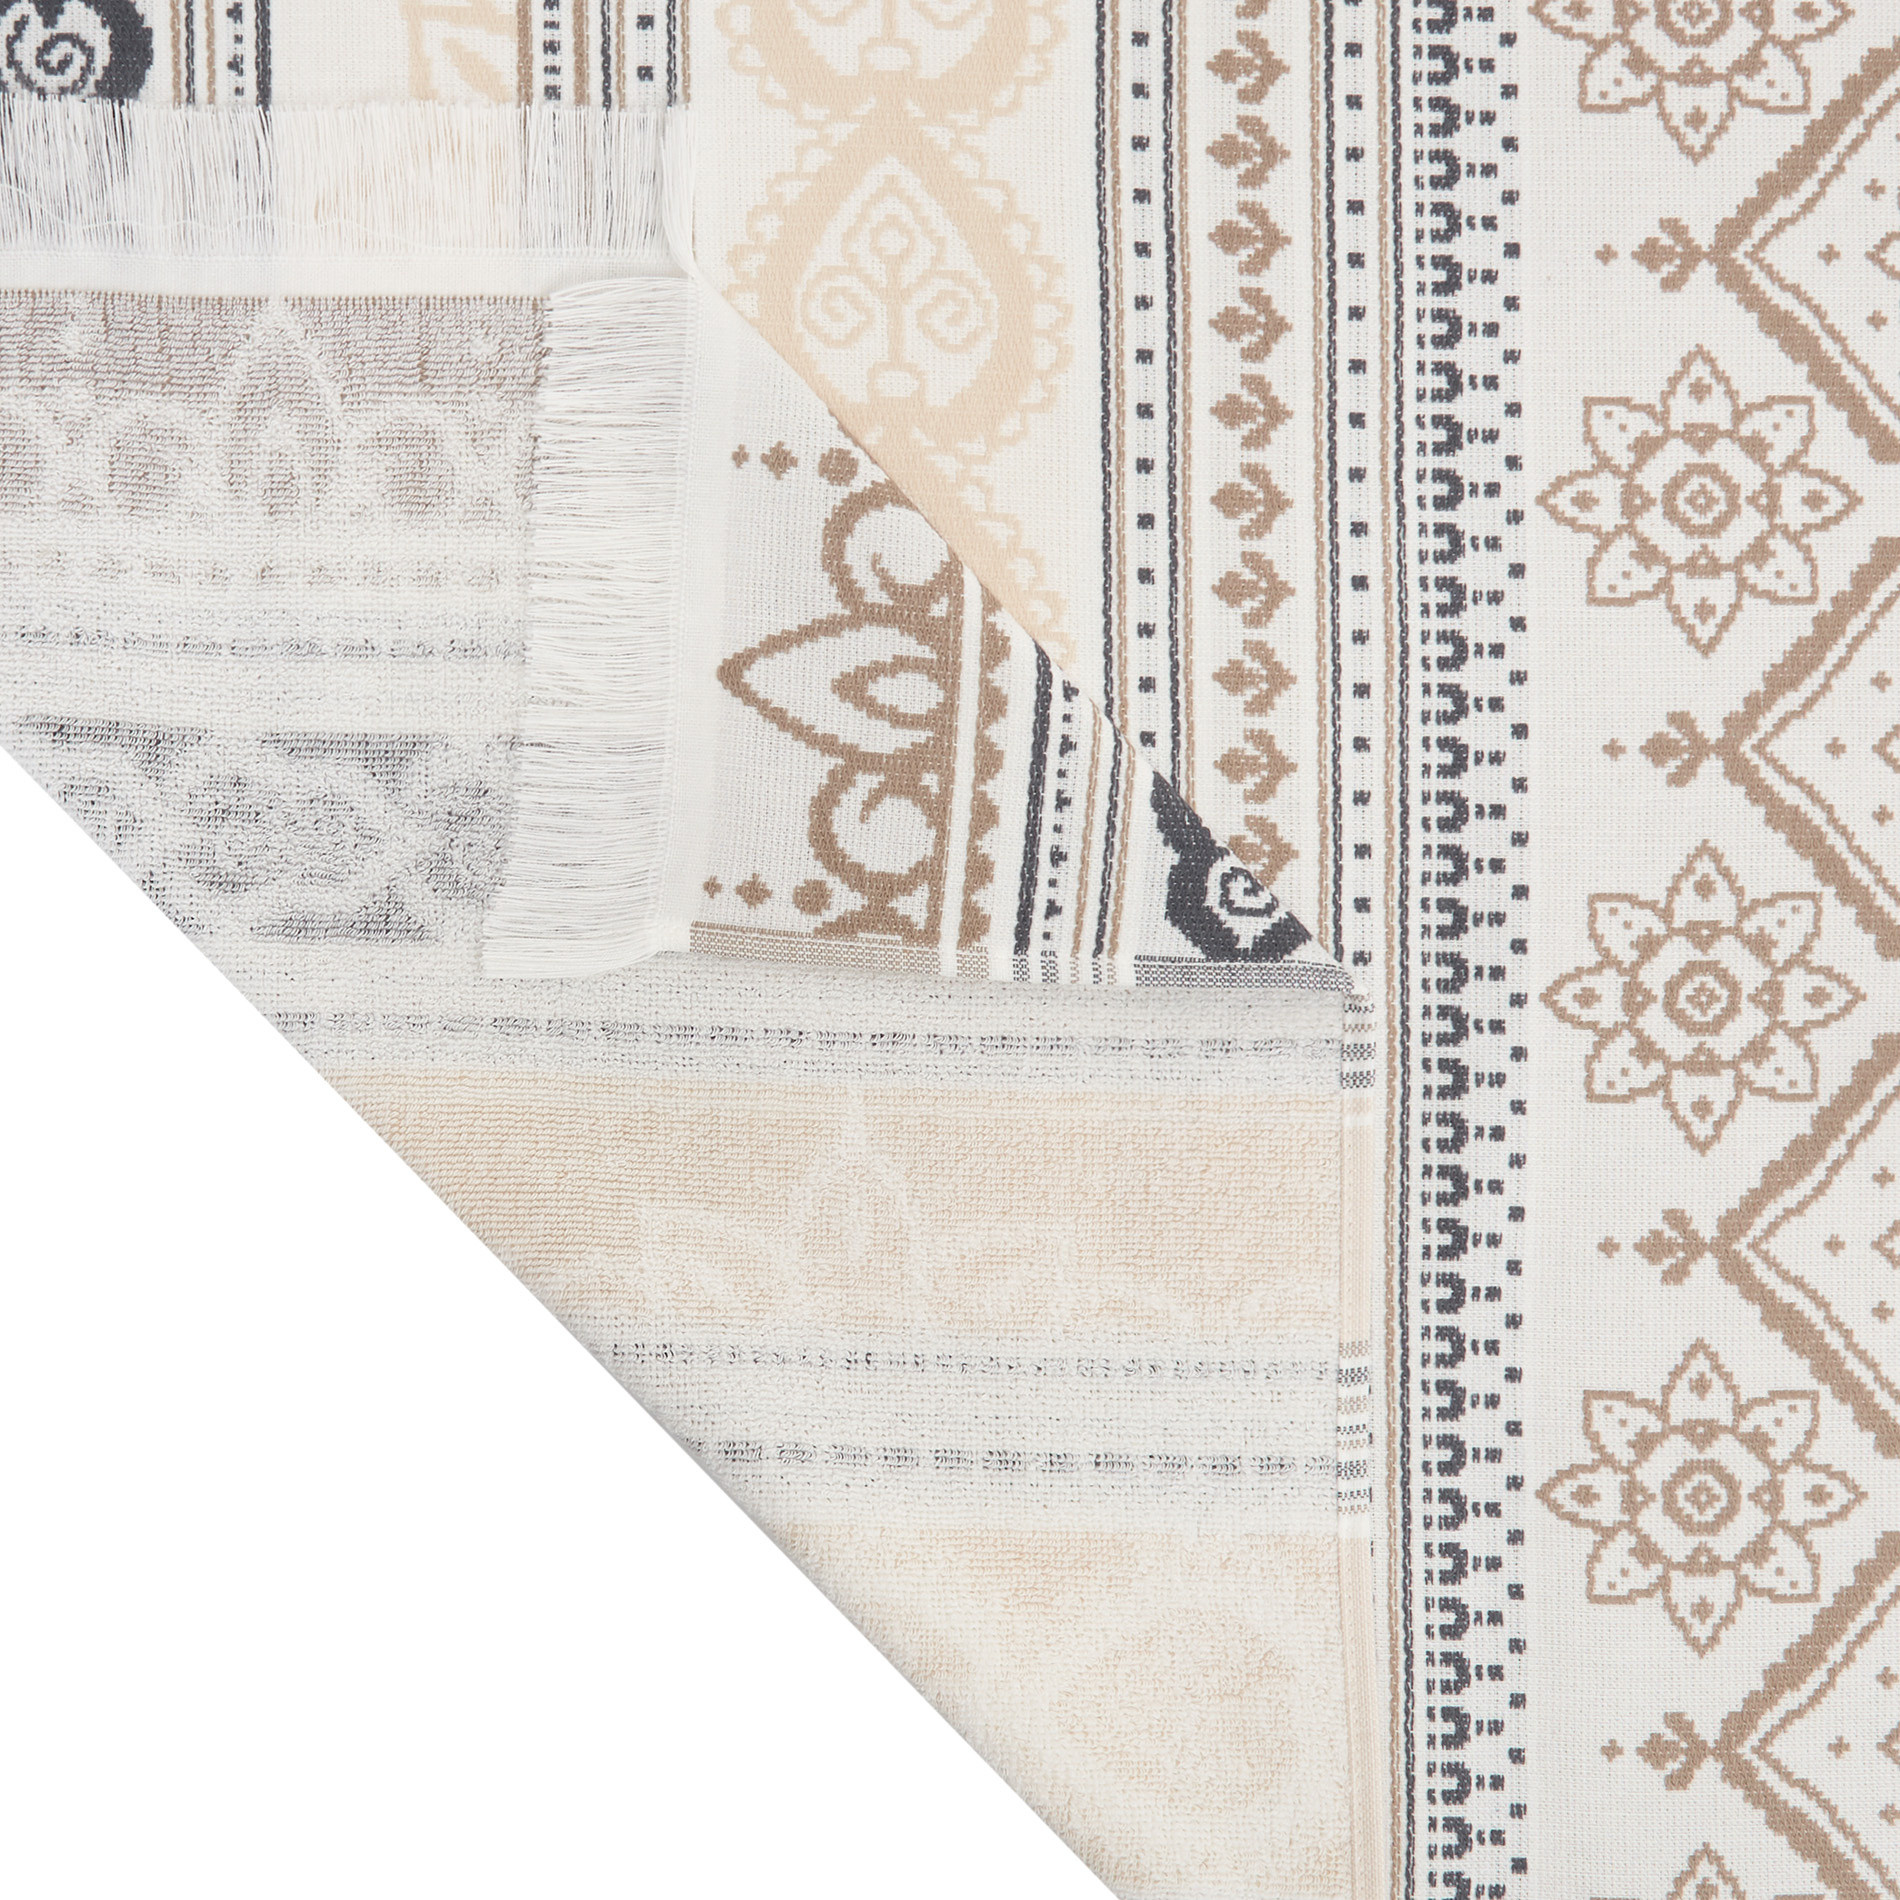 Telo mare hammam cotone jacquard disegno tecnico, Beige, large image number 1